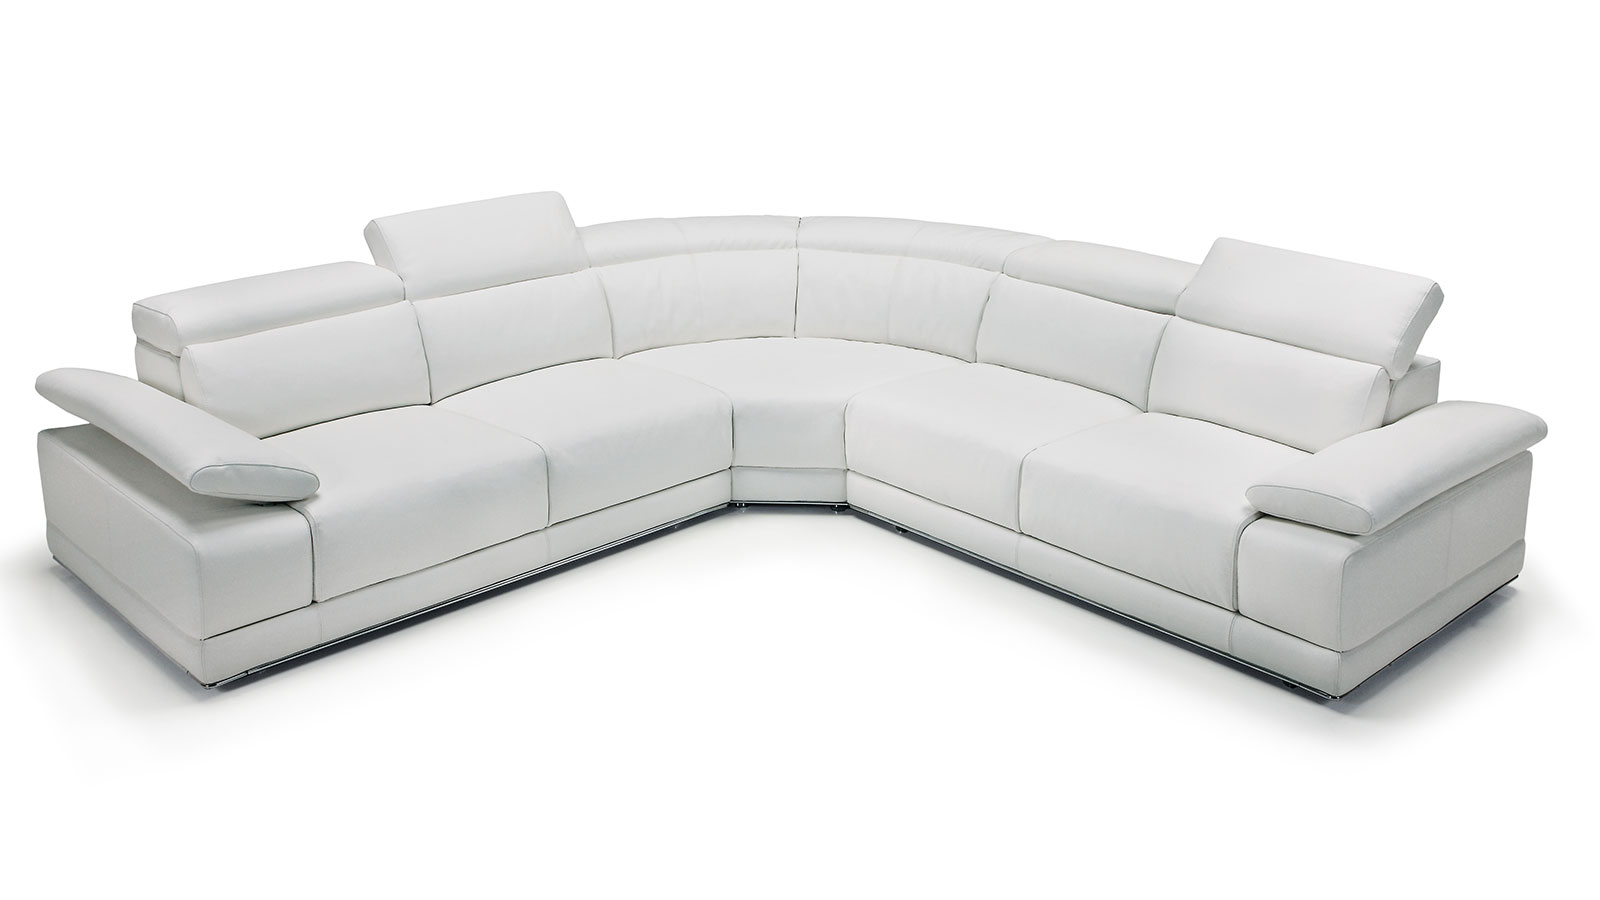 Sofas divatto 201453 revista muebles mobiliario de dise o for Sofas divatto outlet